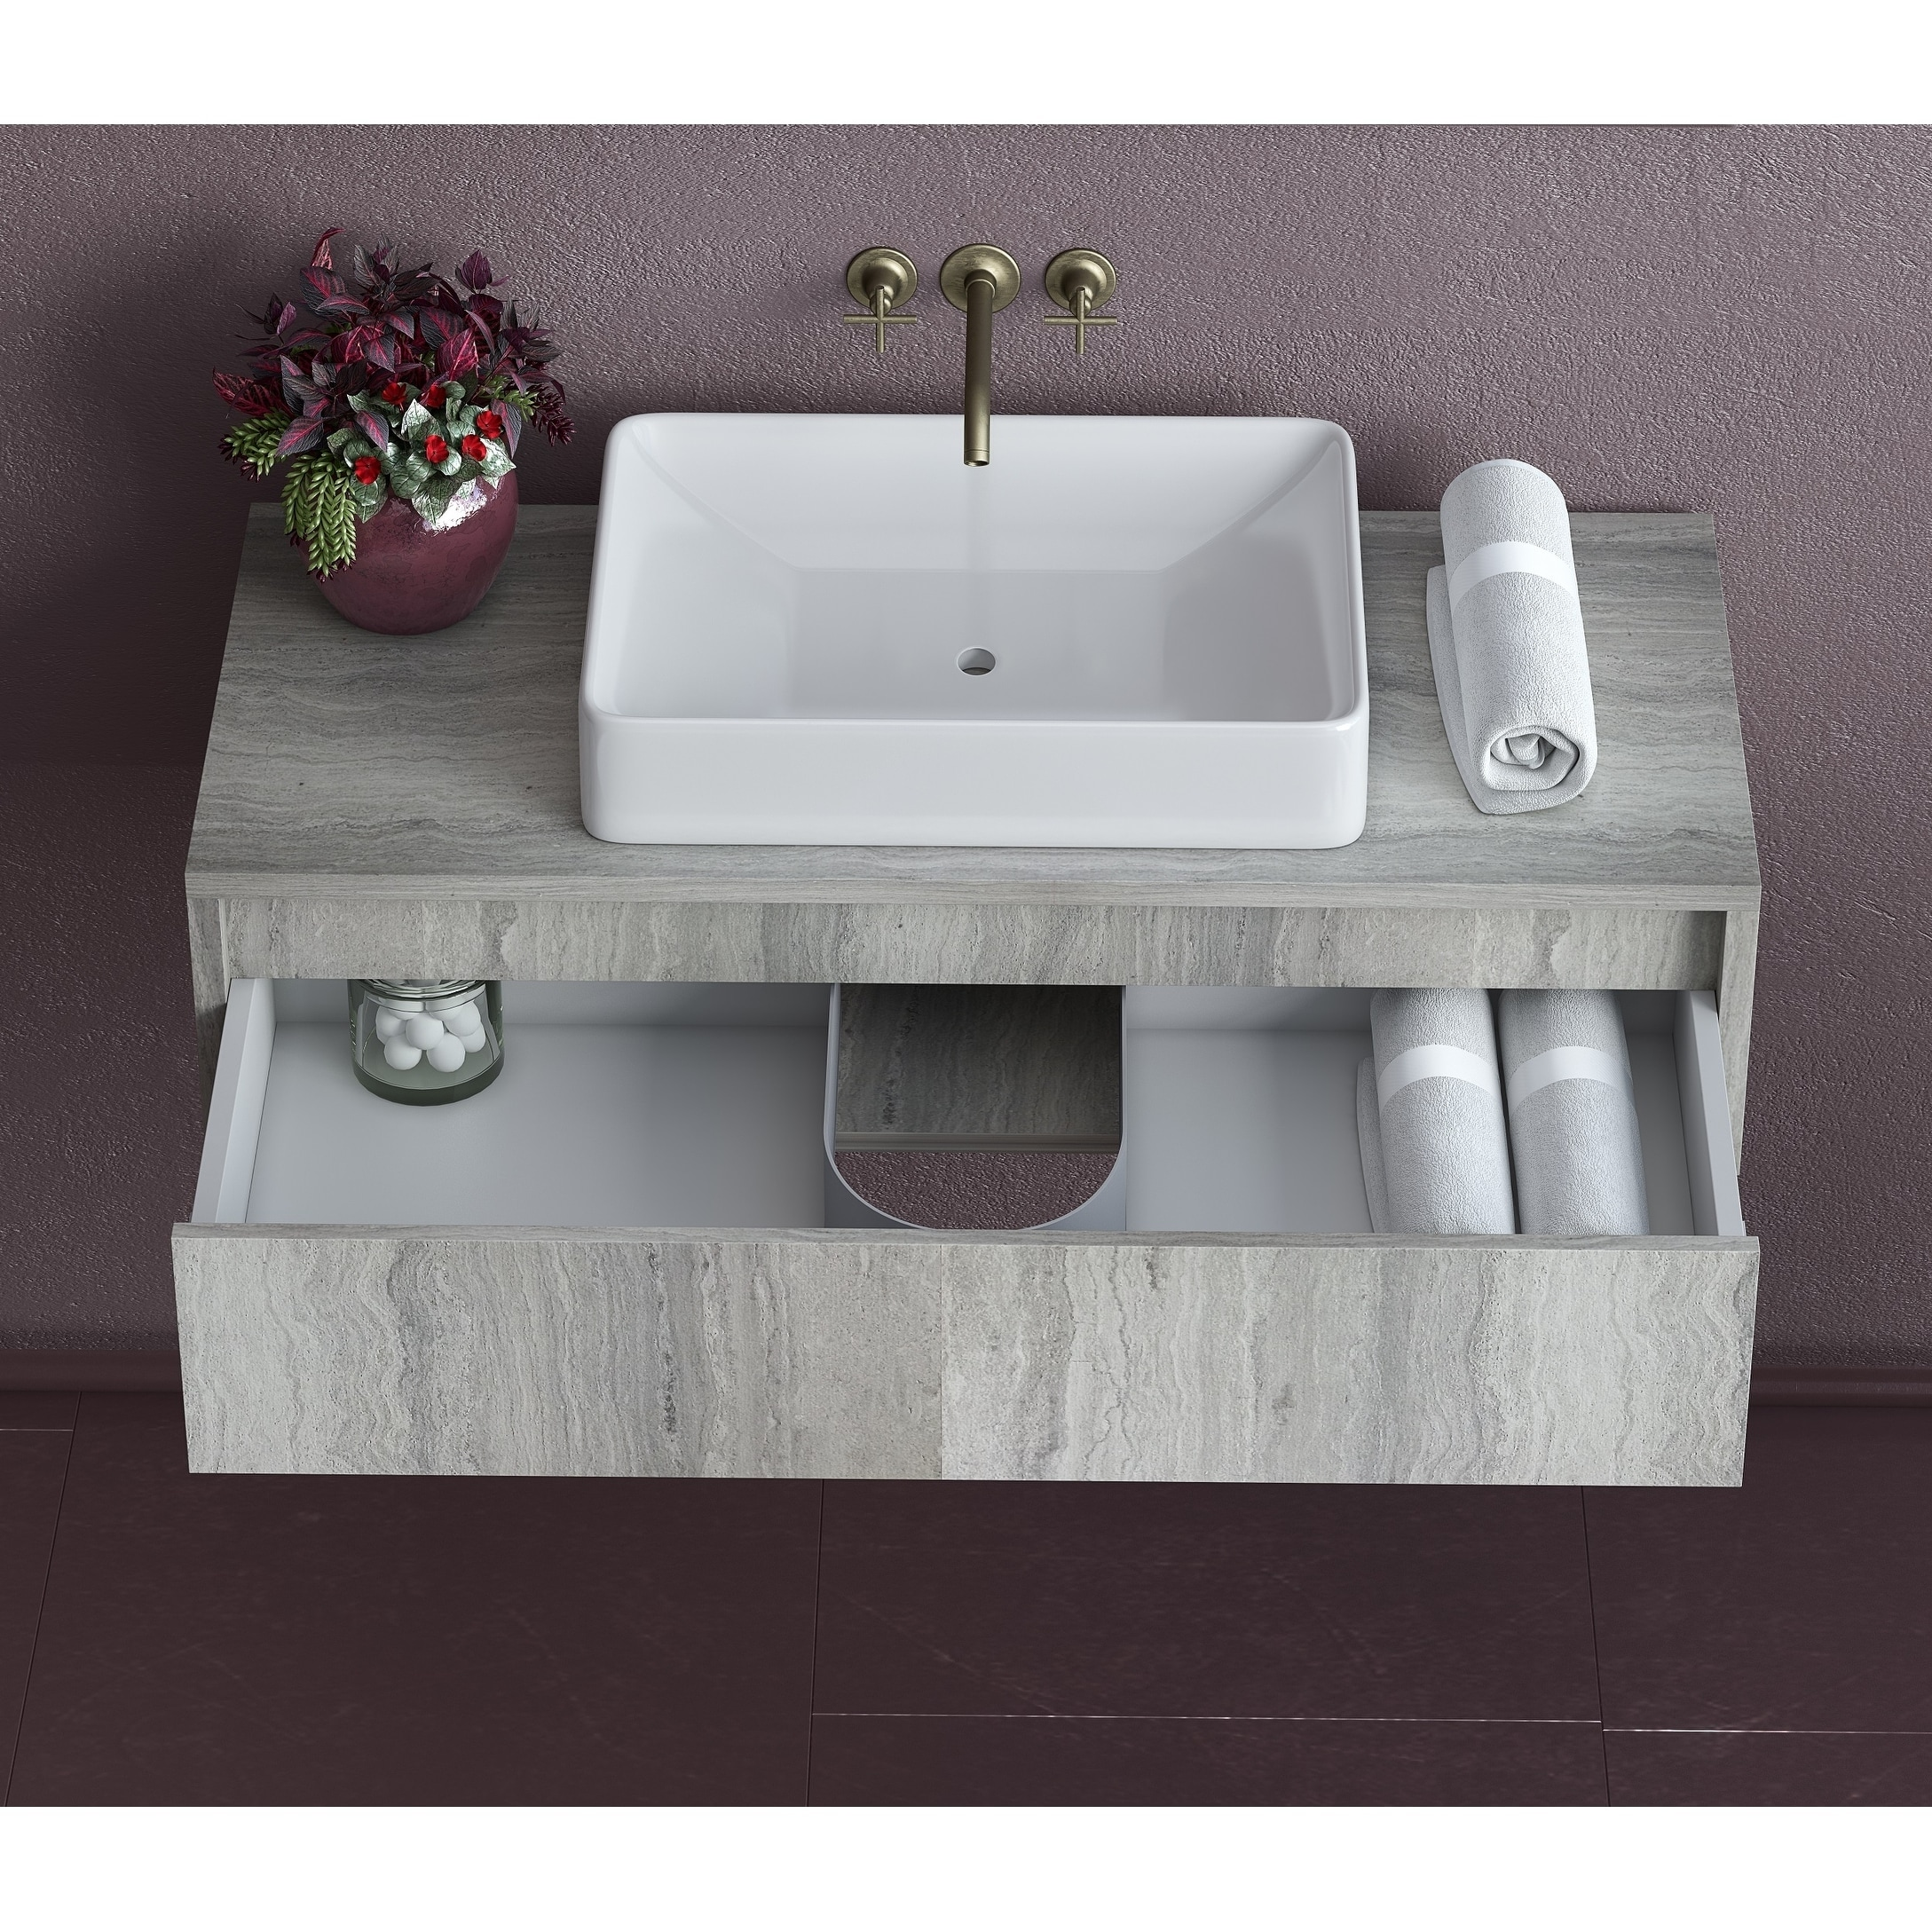 36 Inch Floating Oak Bathroom Vanity Sink Set Grey Oak With White Vessel Sink Overstock 30740266